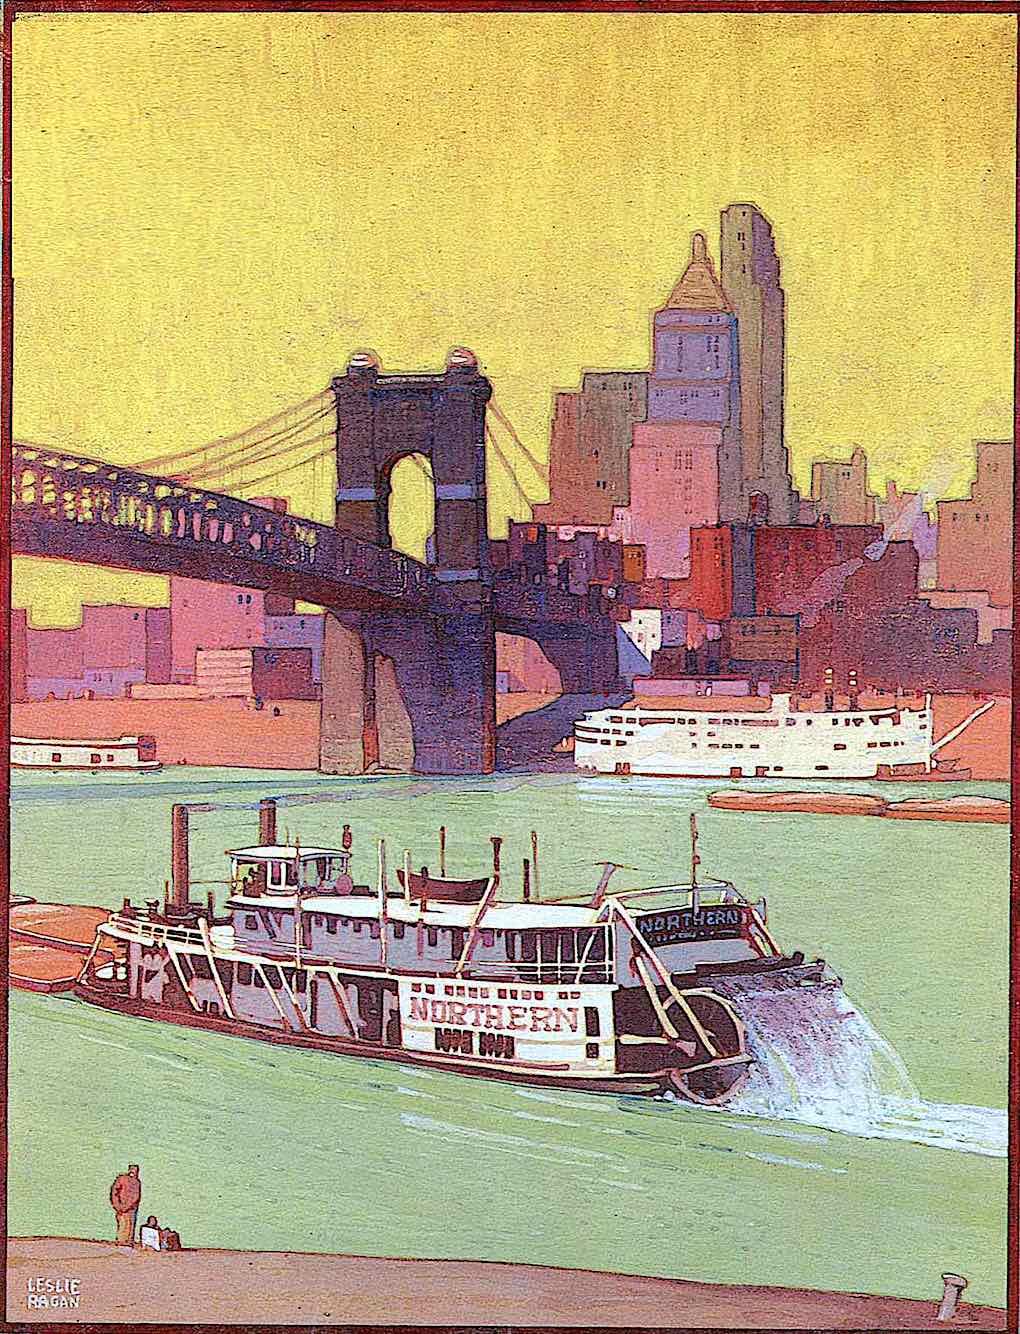 a Leslie Ragan illustration of a 1900s paddlewheel boat on an urban river